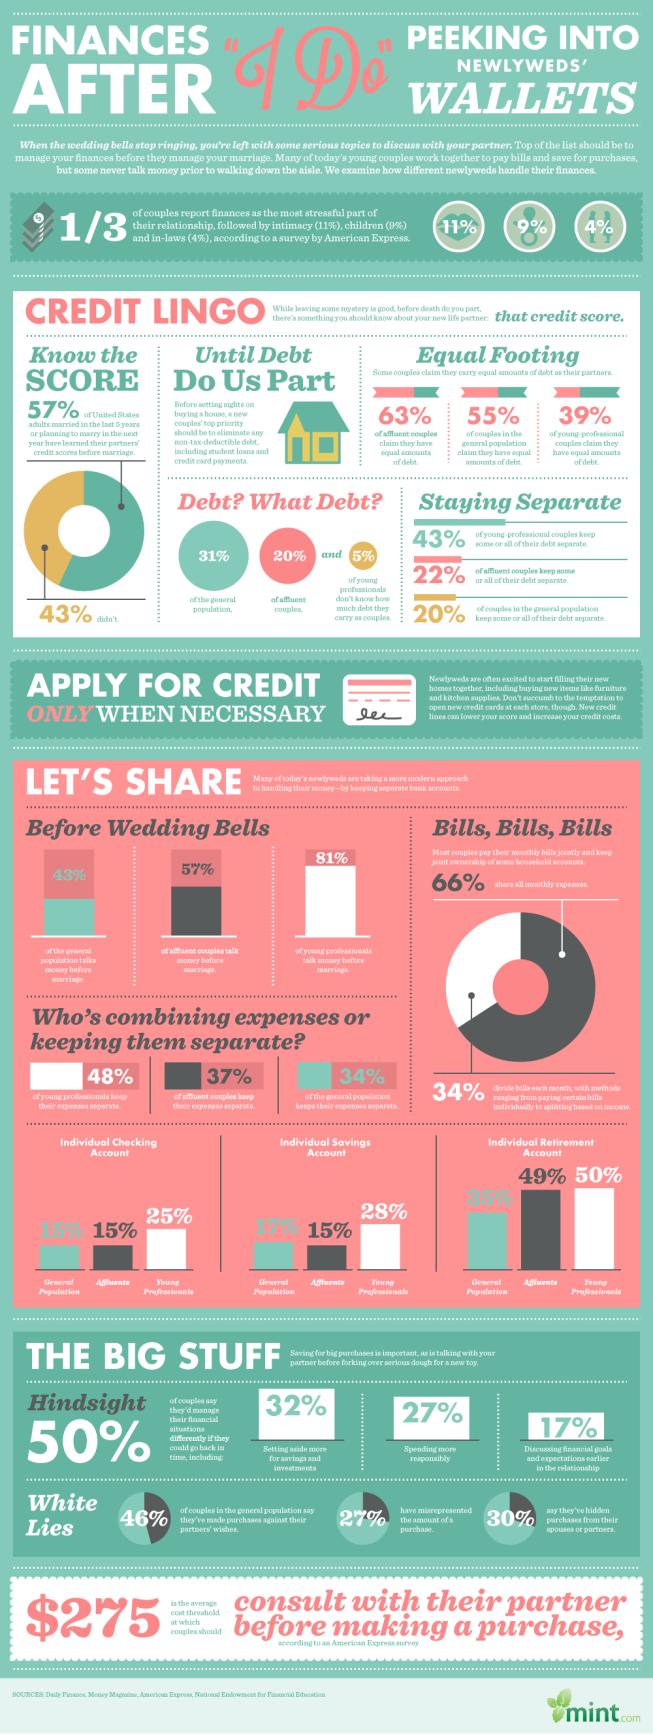 050813-WeddingFinances_v3.lh[1] copy